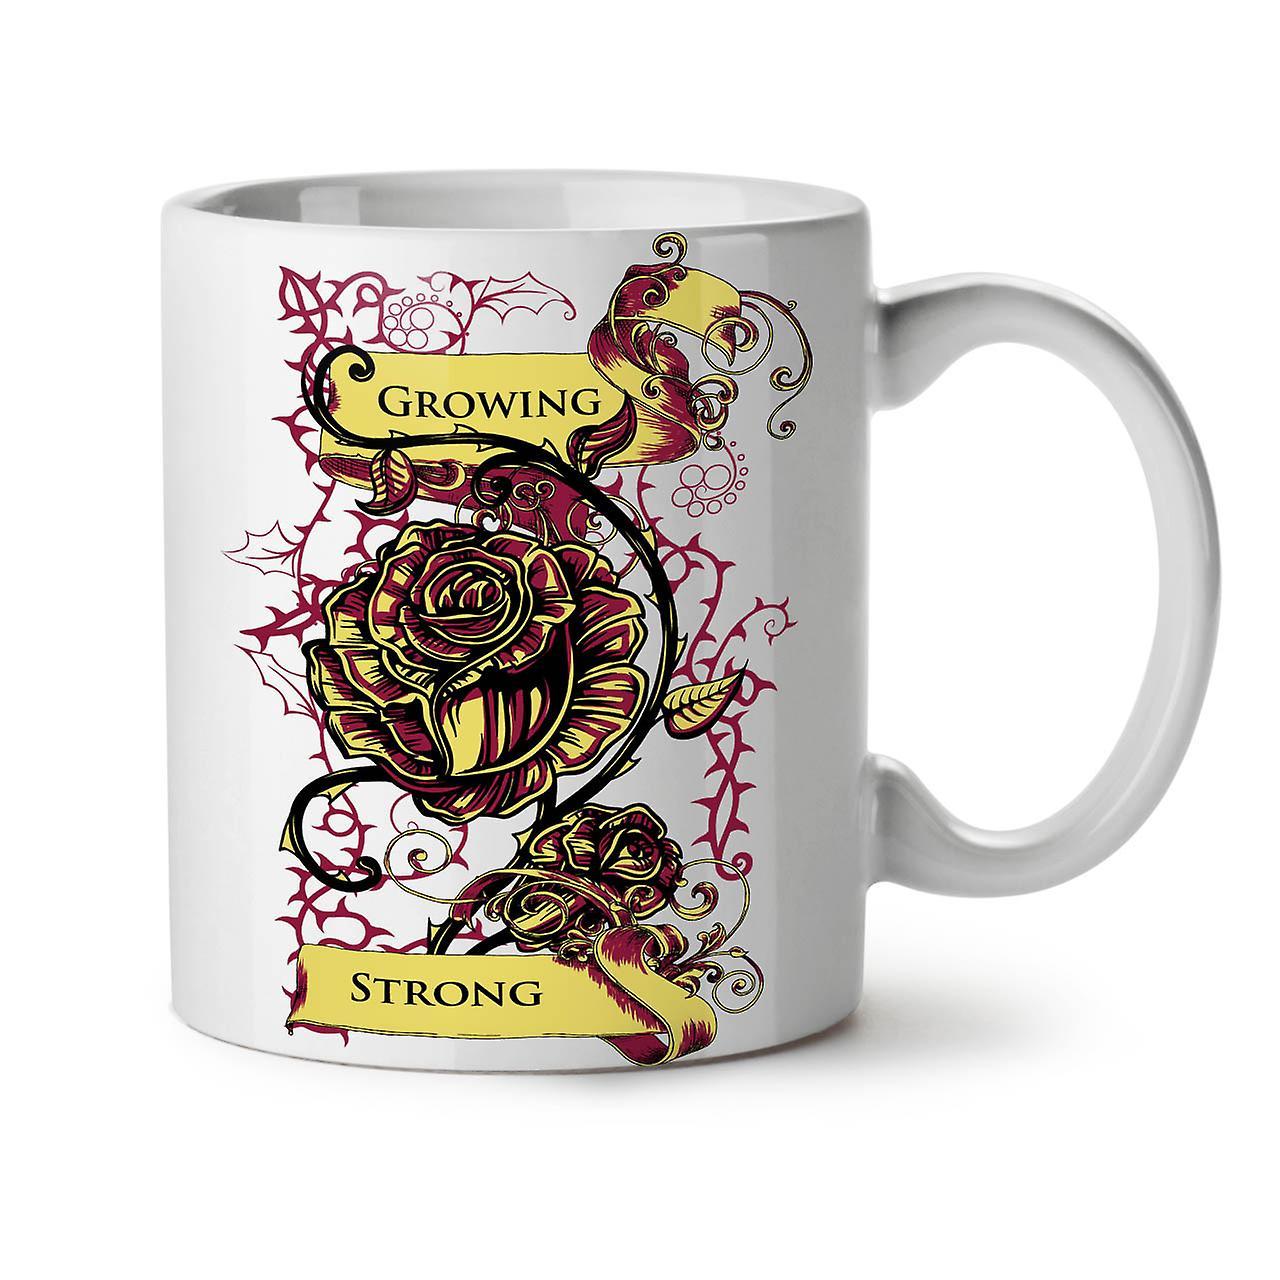 Growing Strong Slogan NEW White Tea Coffee Ceramic Mug 11 oz   Wellcoda